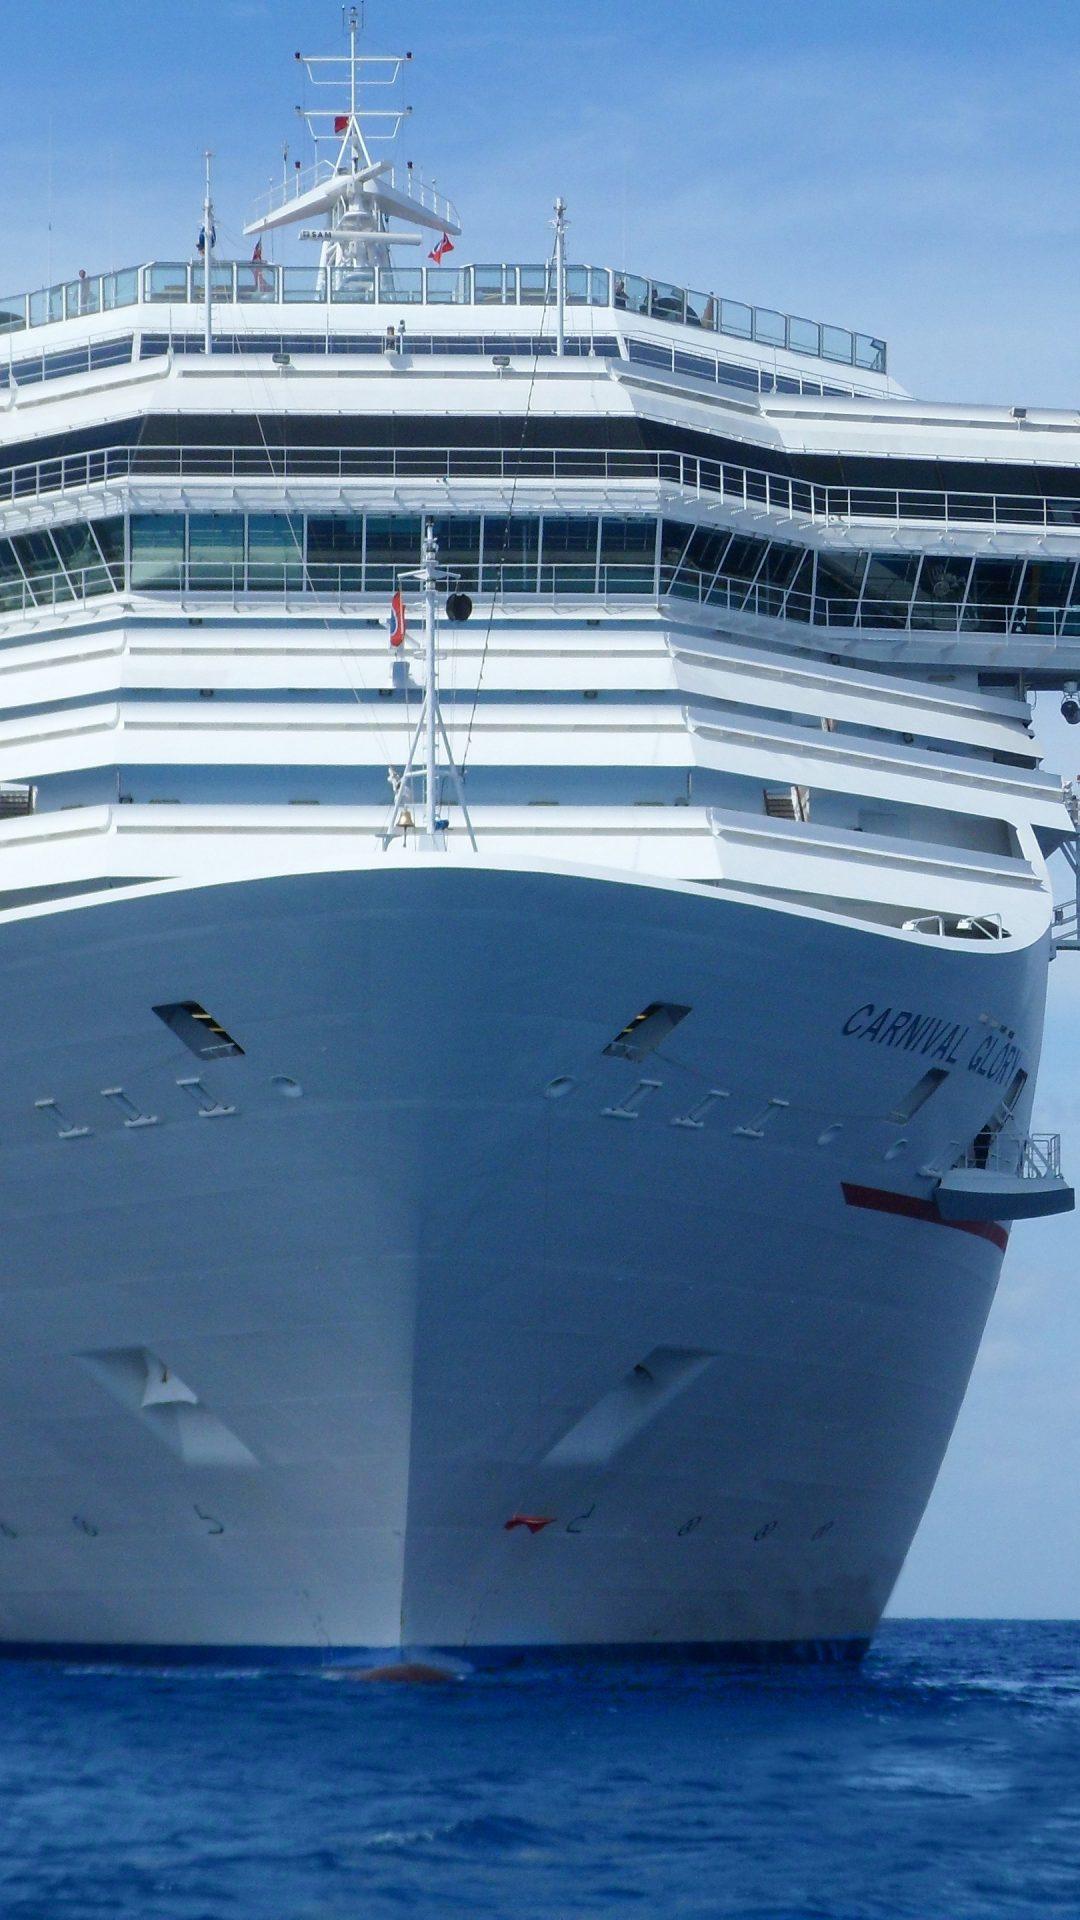 Carnival Glory Cruise Ship 4k Uhd Wallpaper Hd Wallpaper